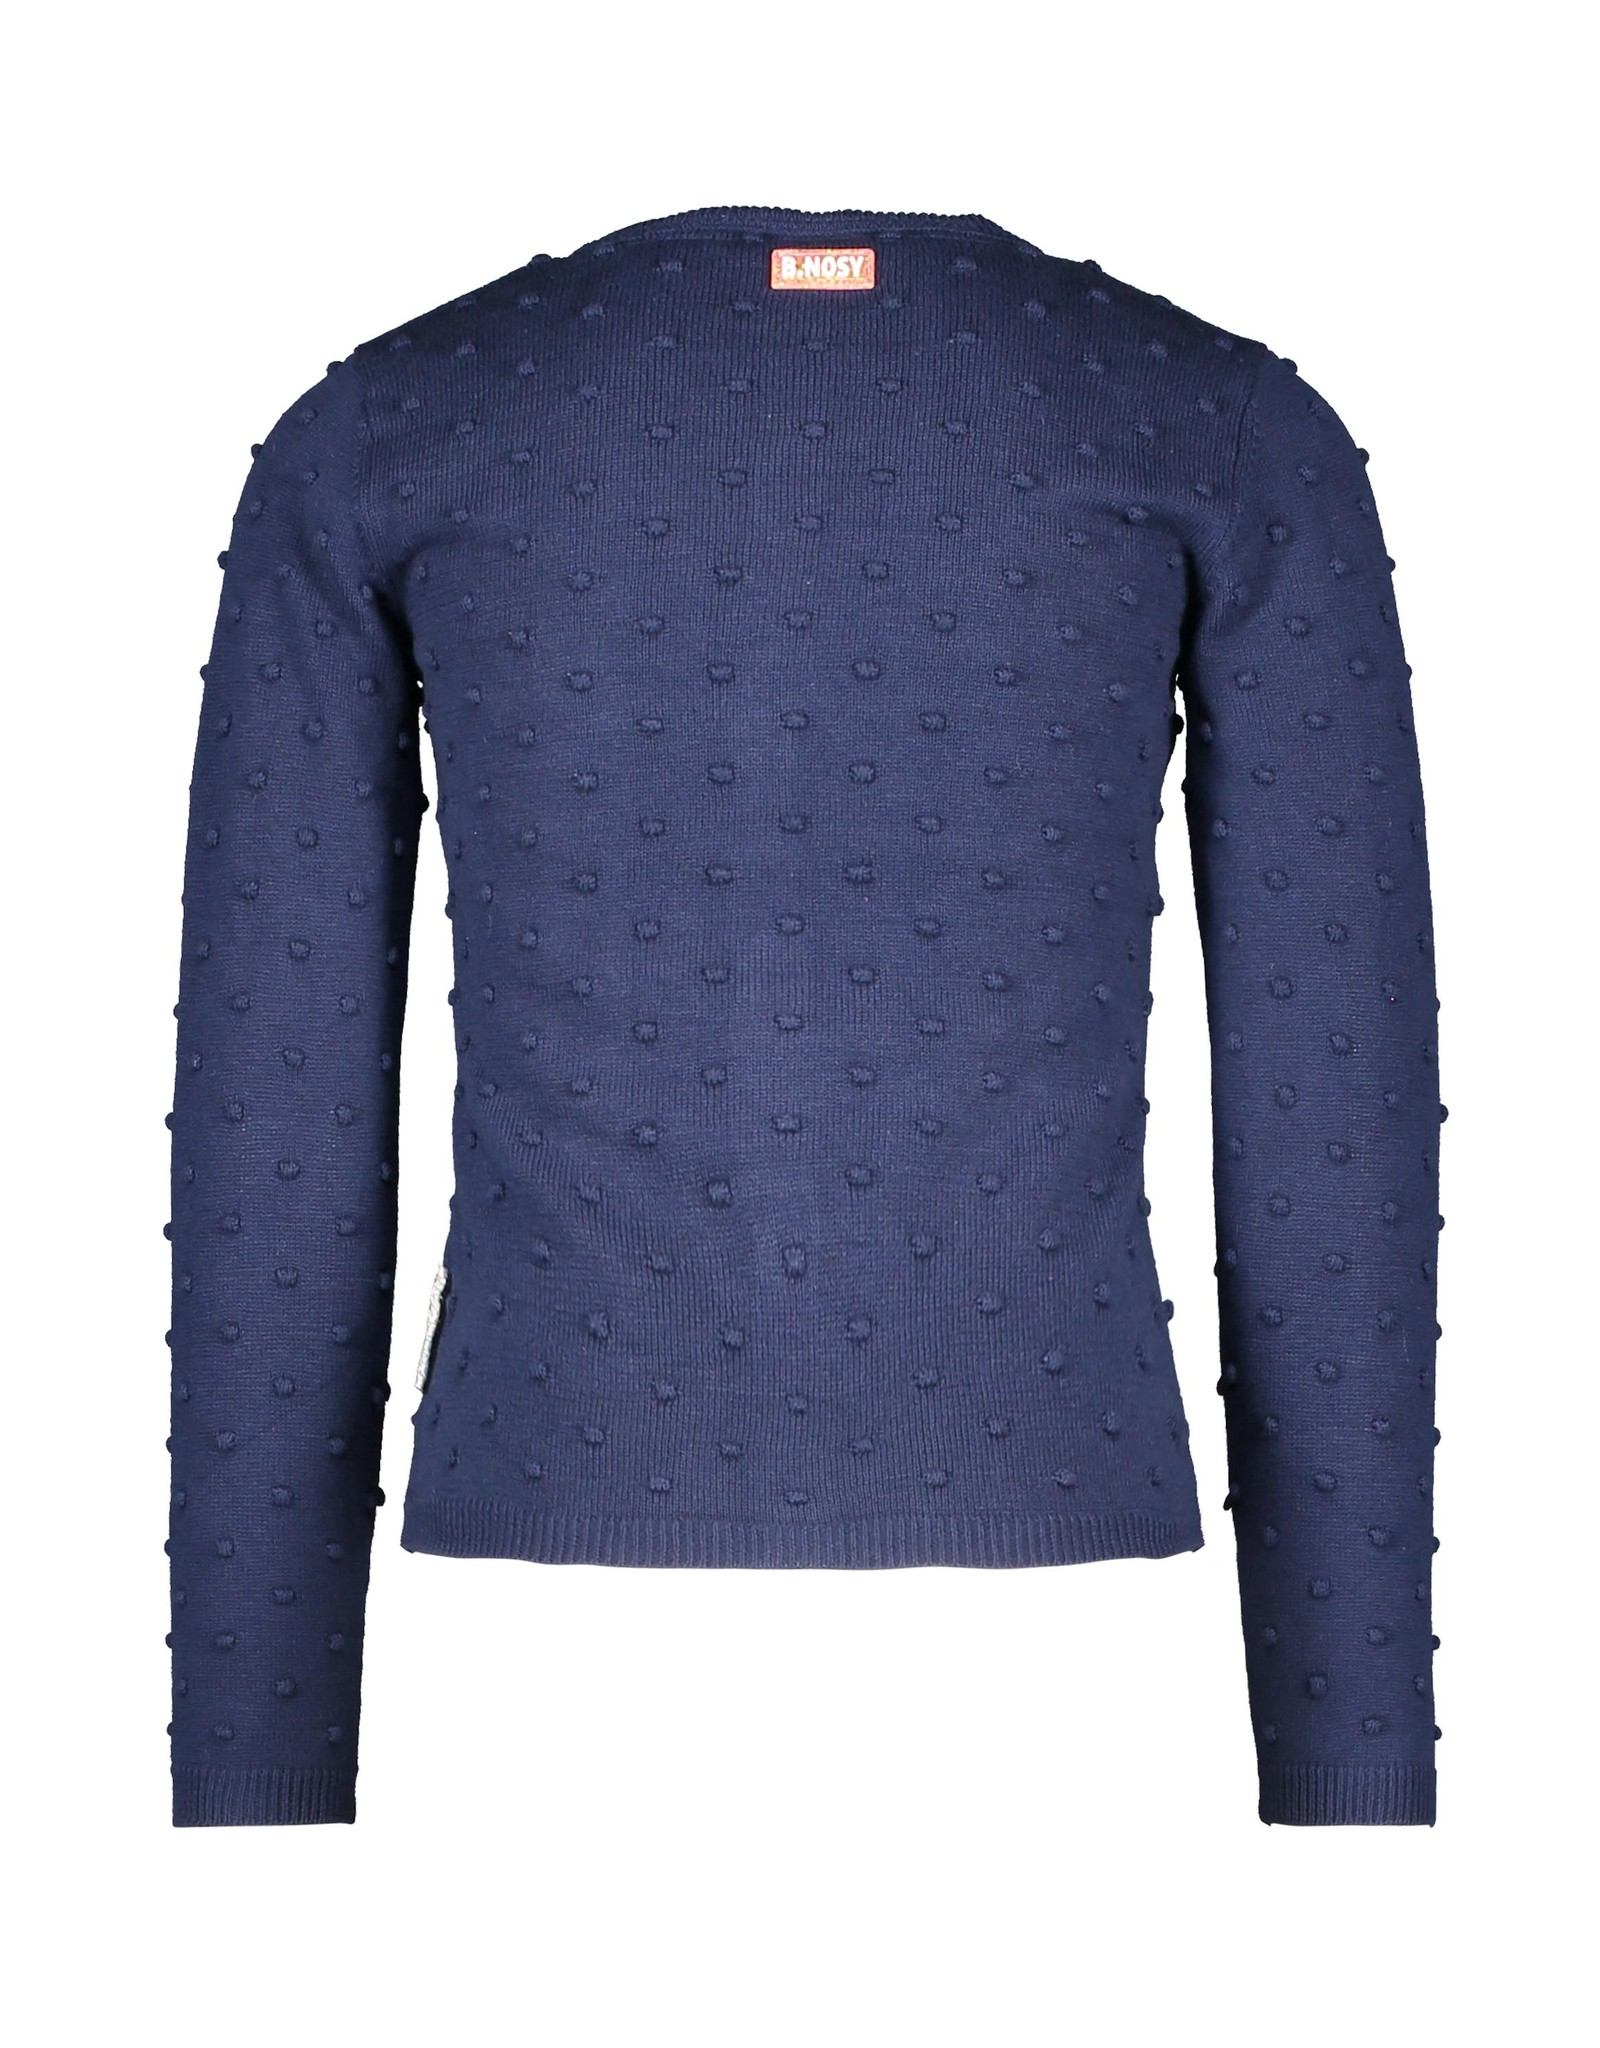 B.Nosy Girls jaquard knitted cardigan